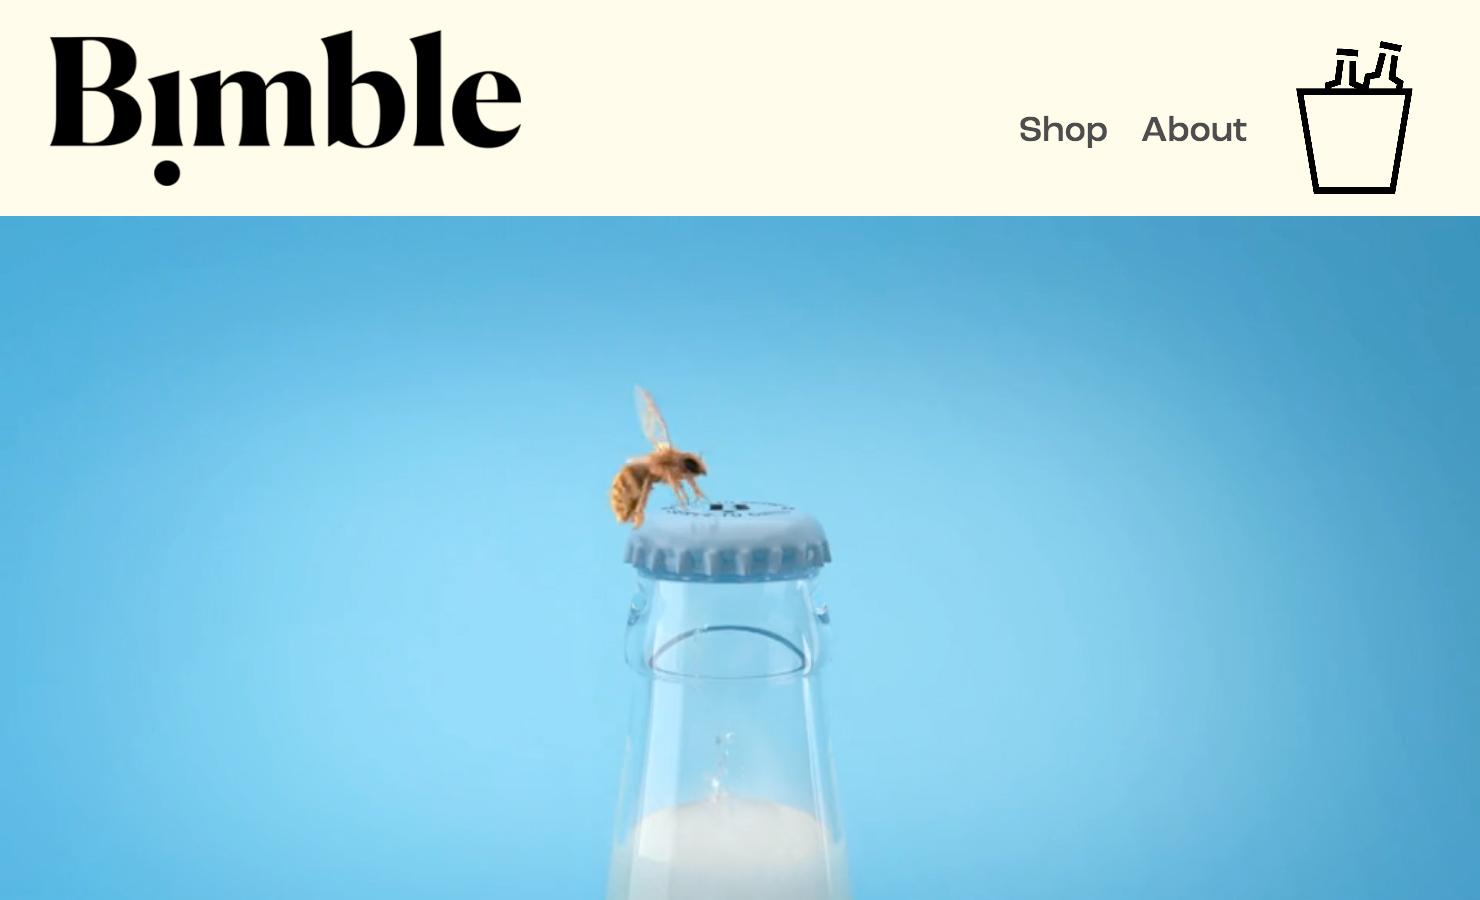 Drink Bimble